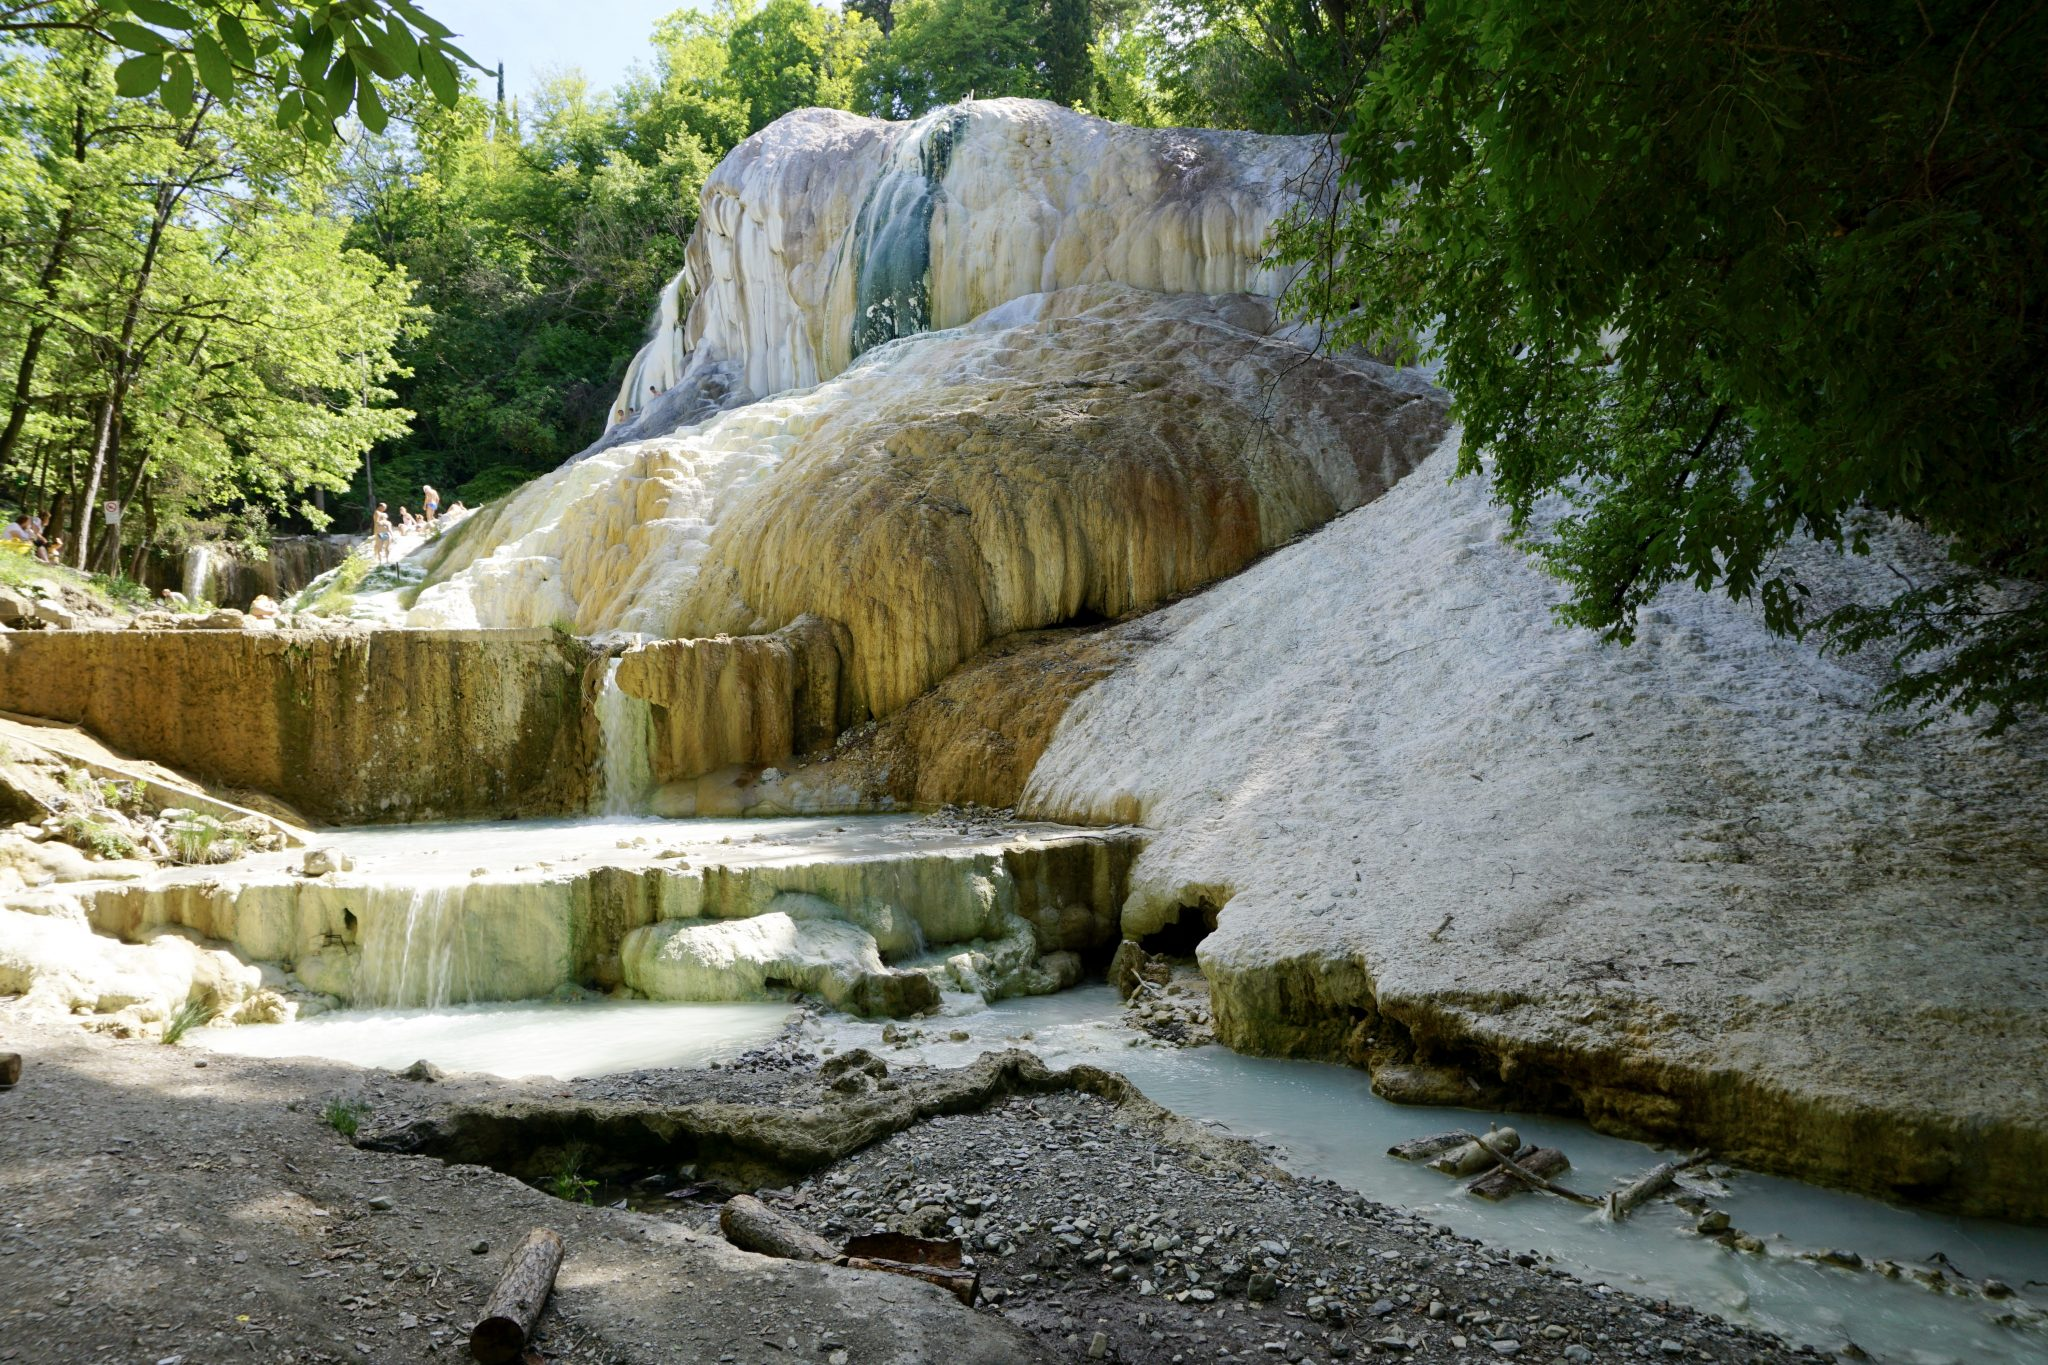 Fosso Bianco in Bagni San Filippo, hot springs, tuscany, italy